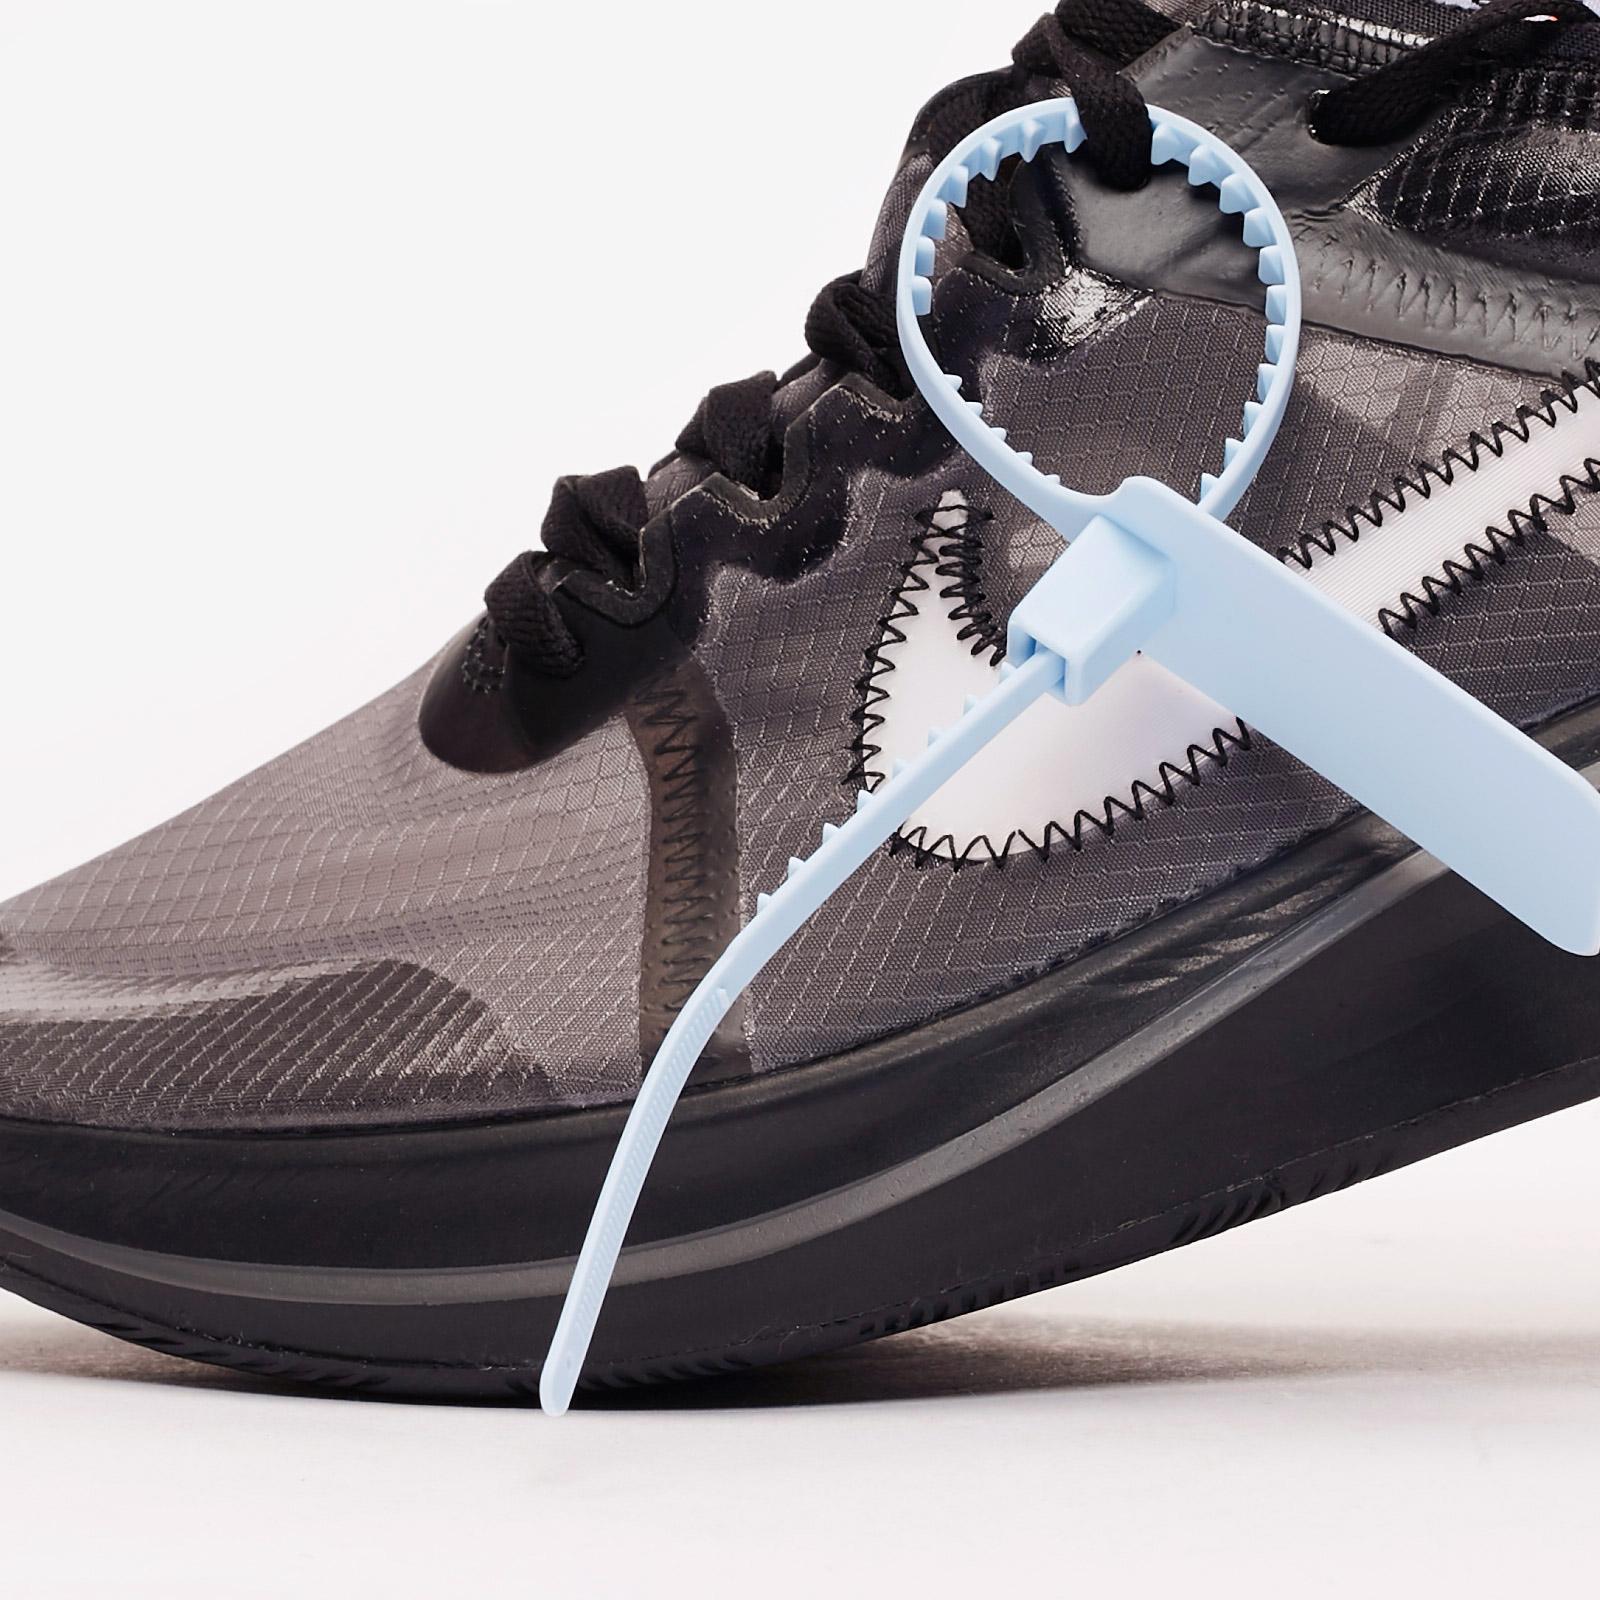 9a93589fab64 Nike The 10  Zoom Fly - Aj4588-001 - Sneakersnstuff